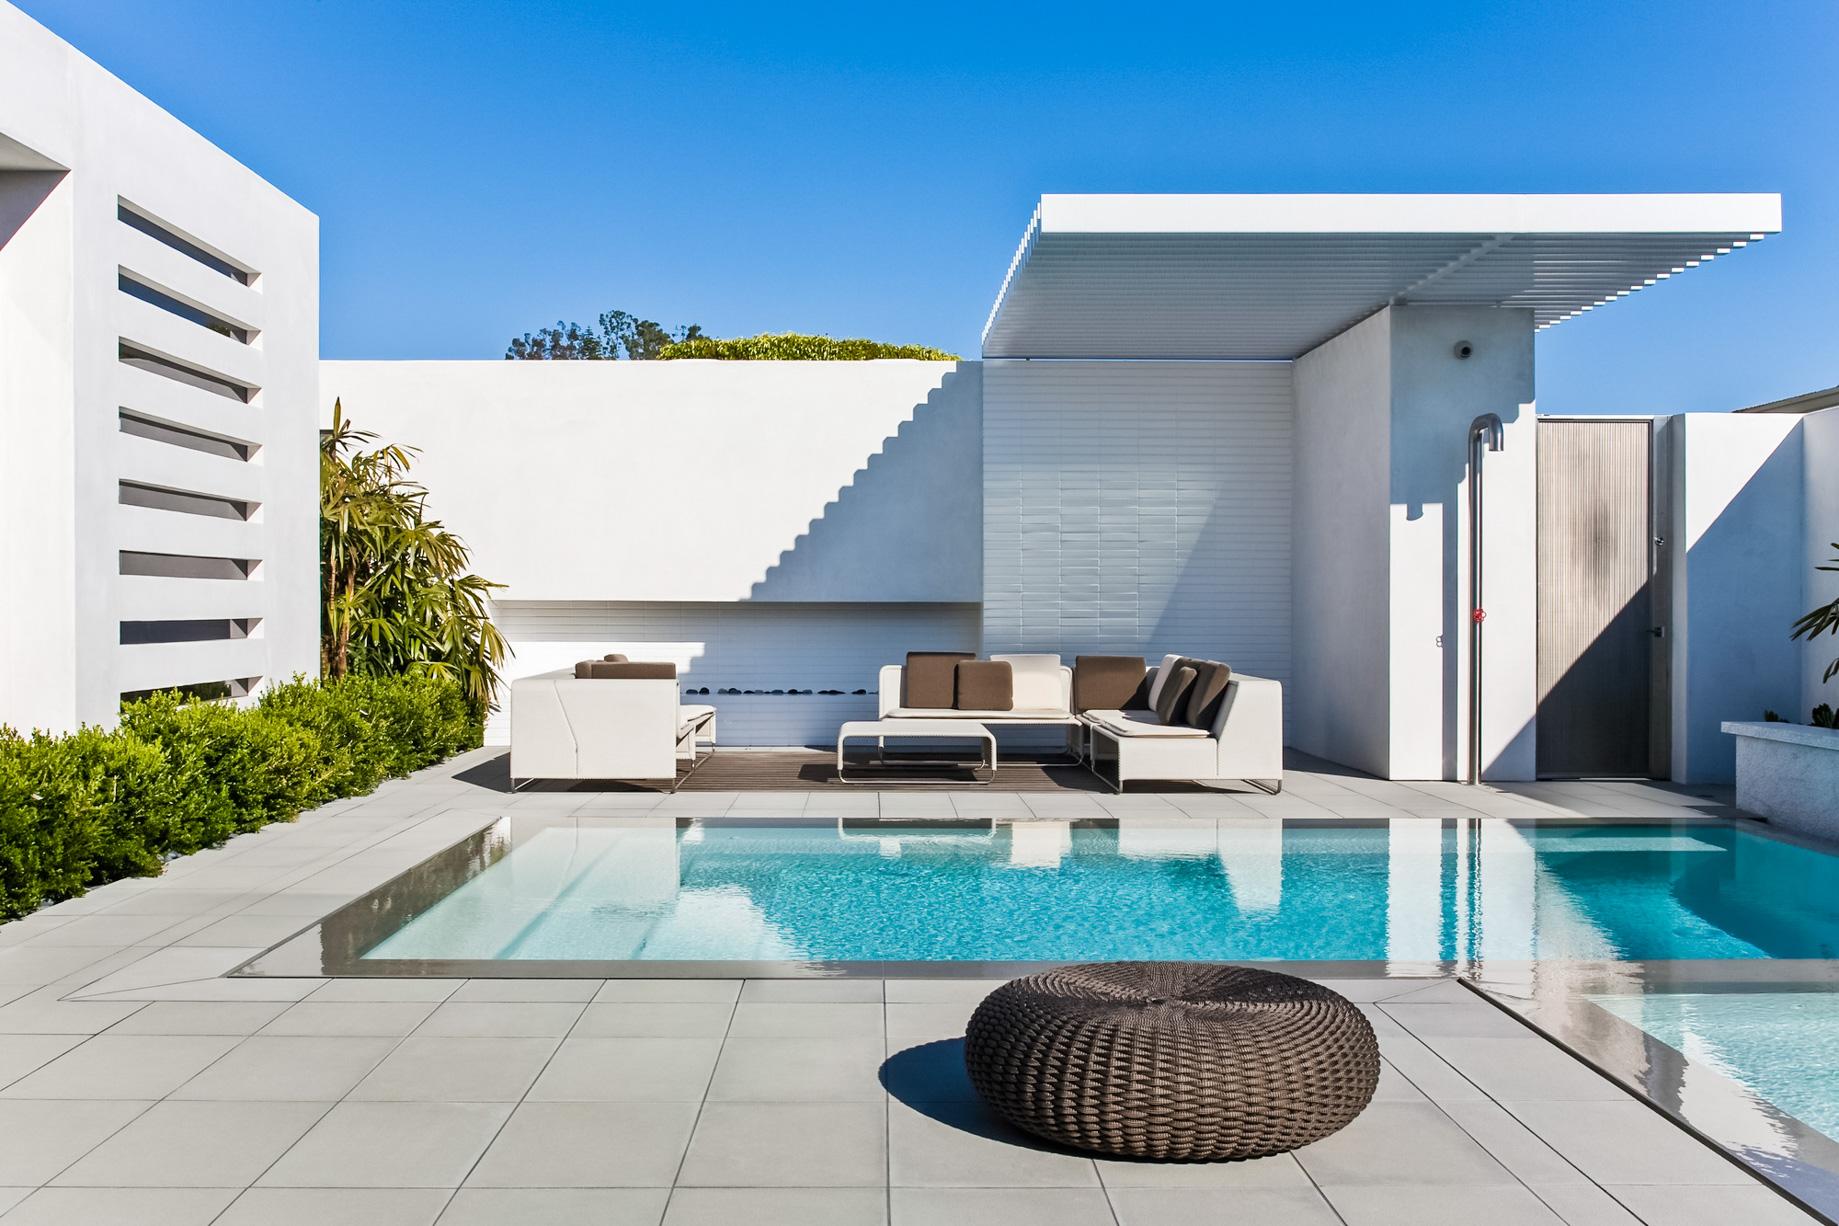 15 – Cormac Residence – 1027 White Sails Way, Corona del Mar, CA, USA